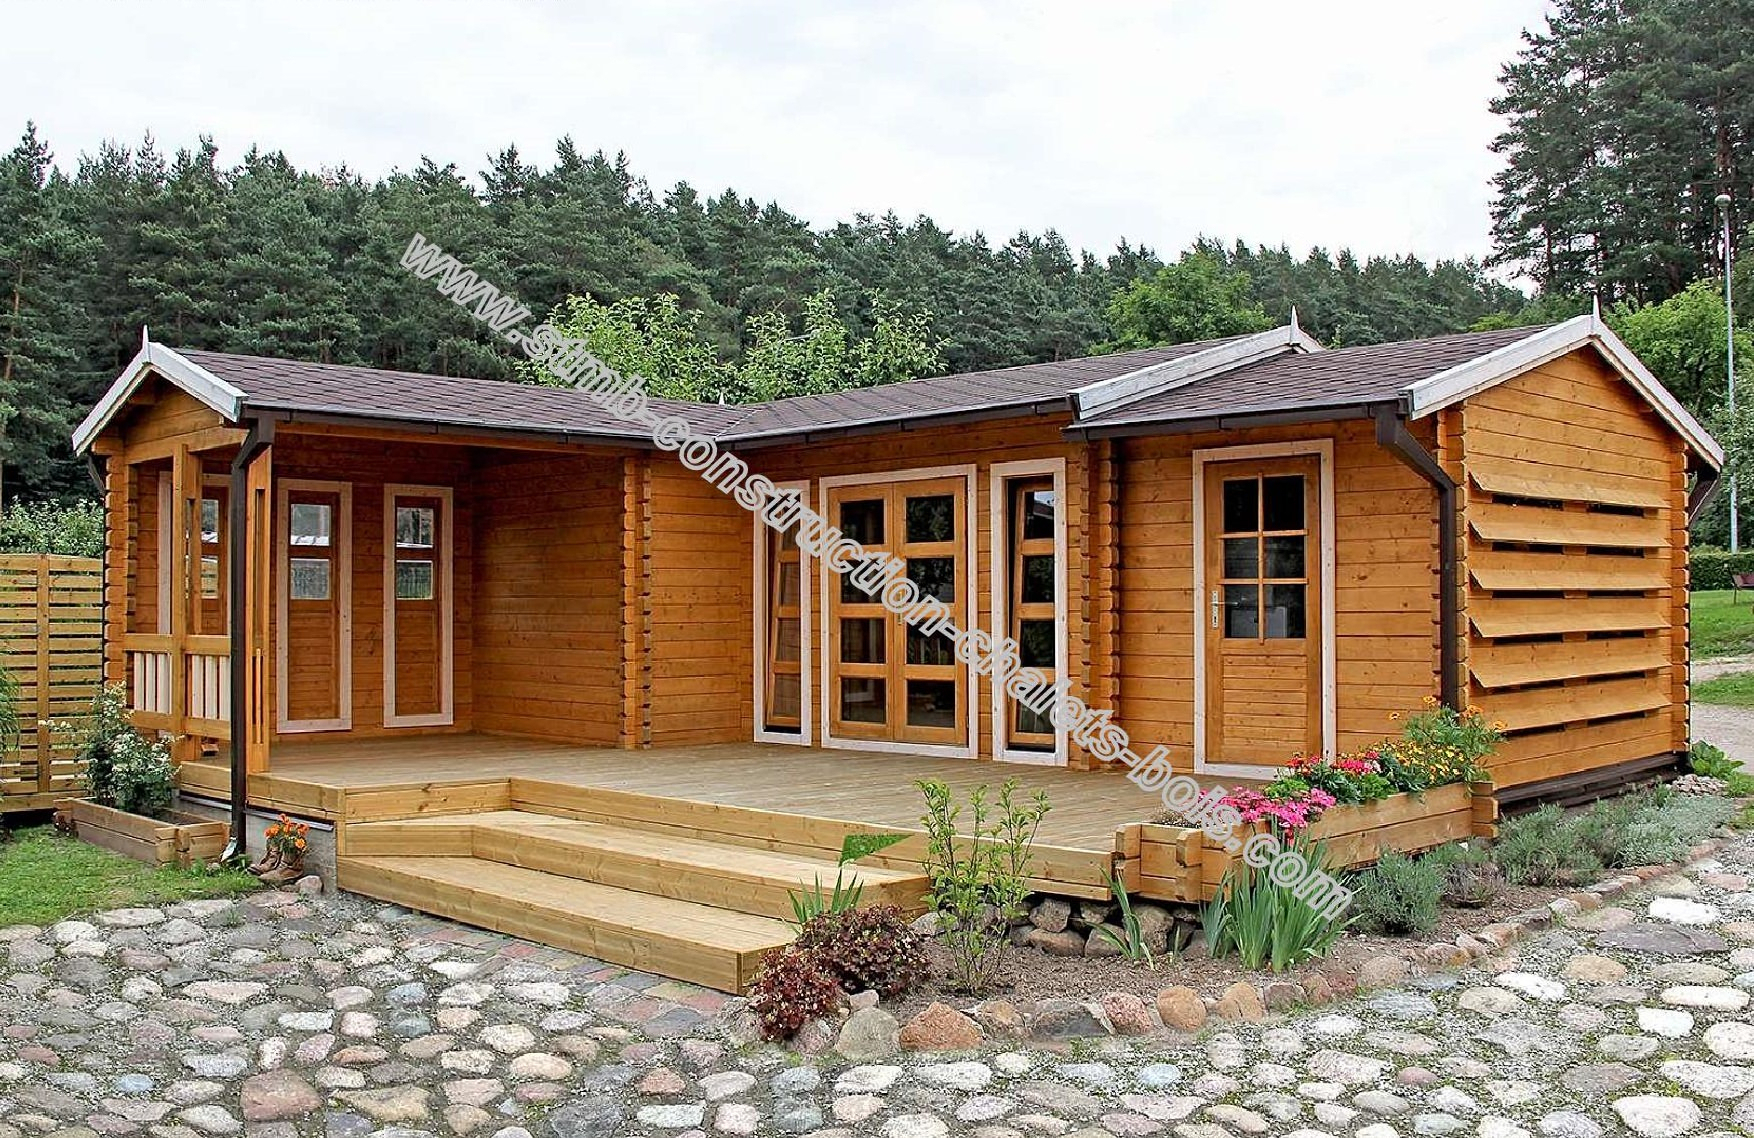 Abri De Jardin Habitable Serre Jardin Bois - Idees ... intérieur Maison De Jardin En Bois Habitable